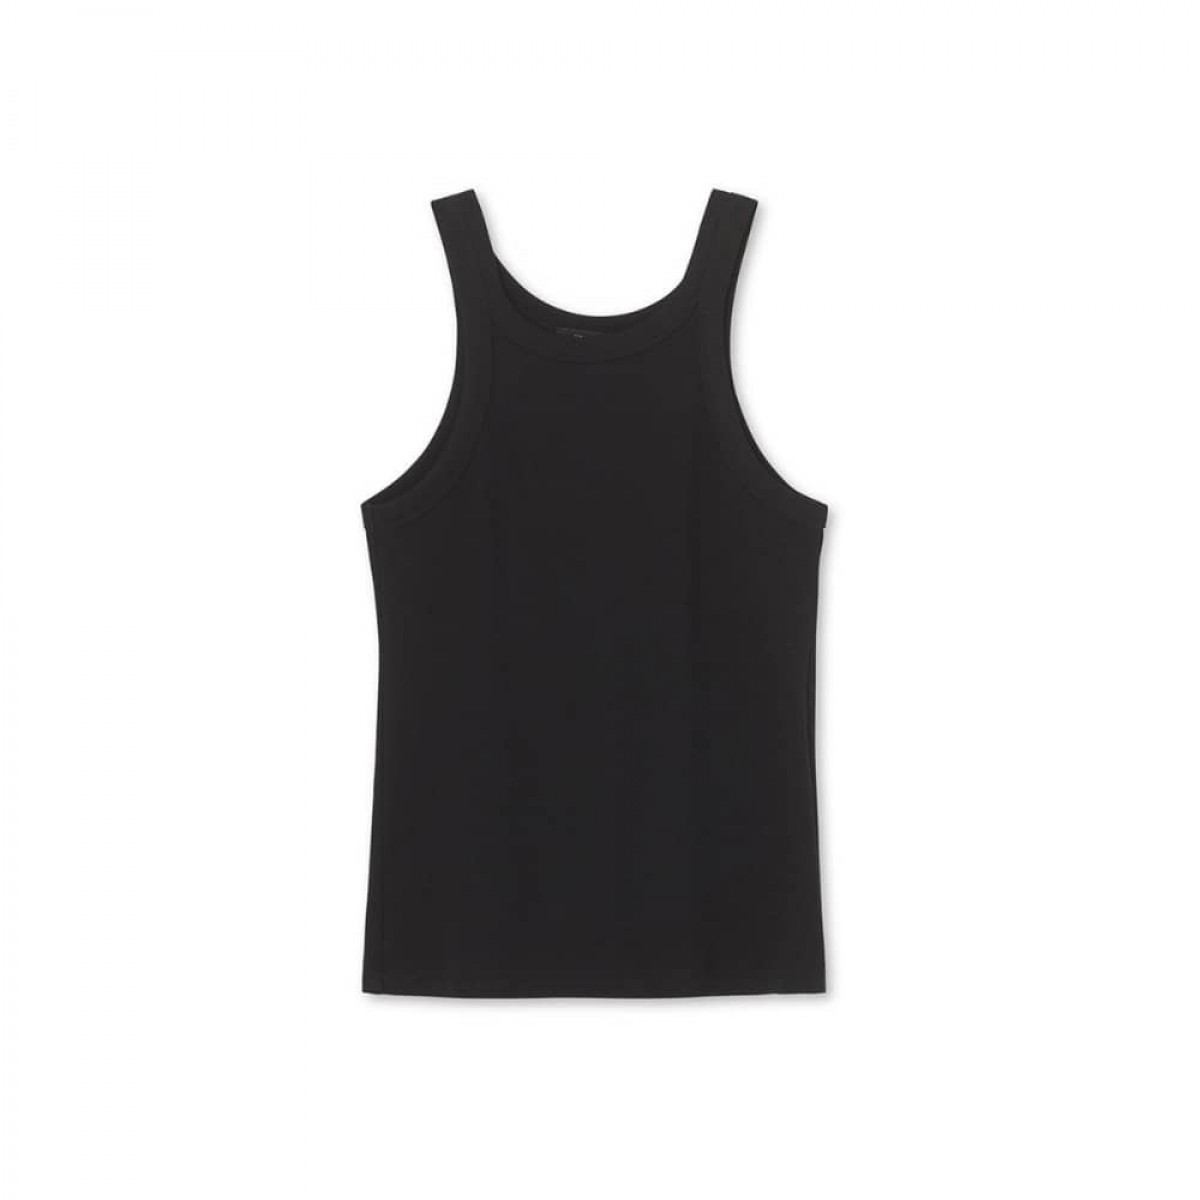 martha top - black